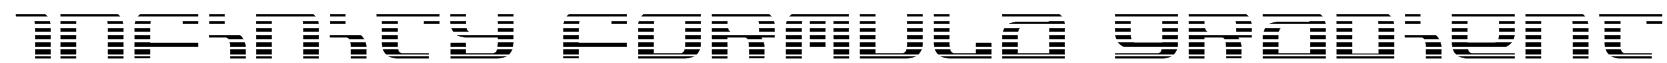 Infinity Formula Gradient Font